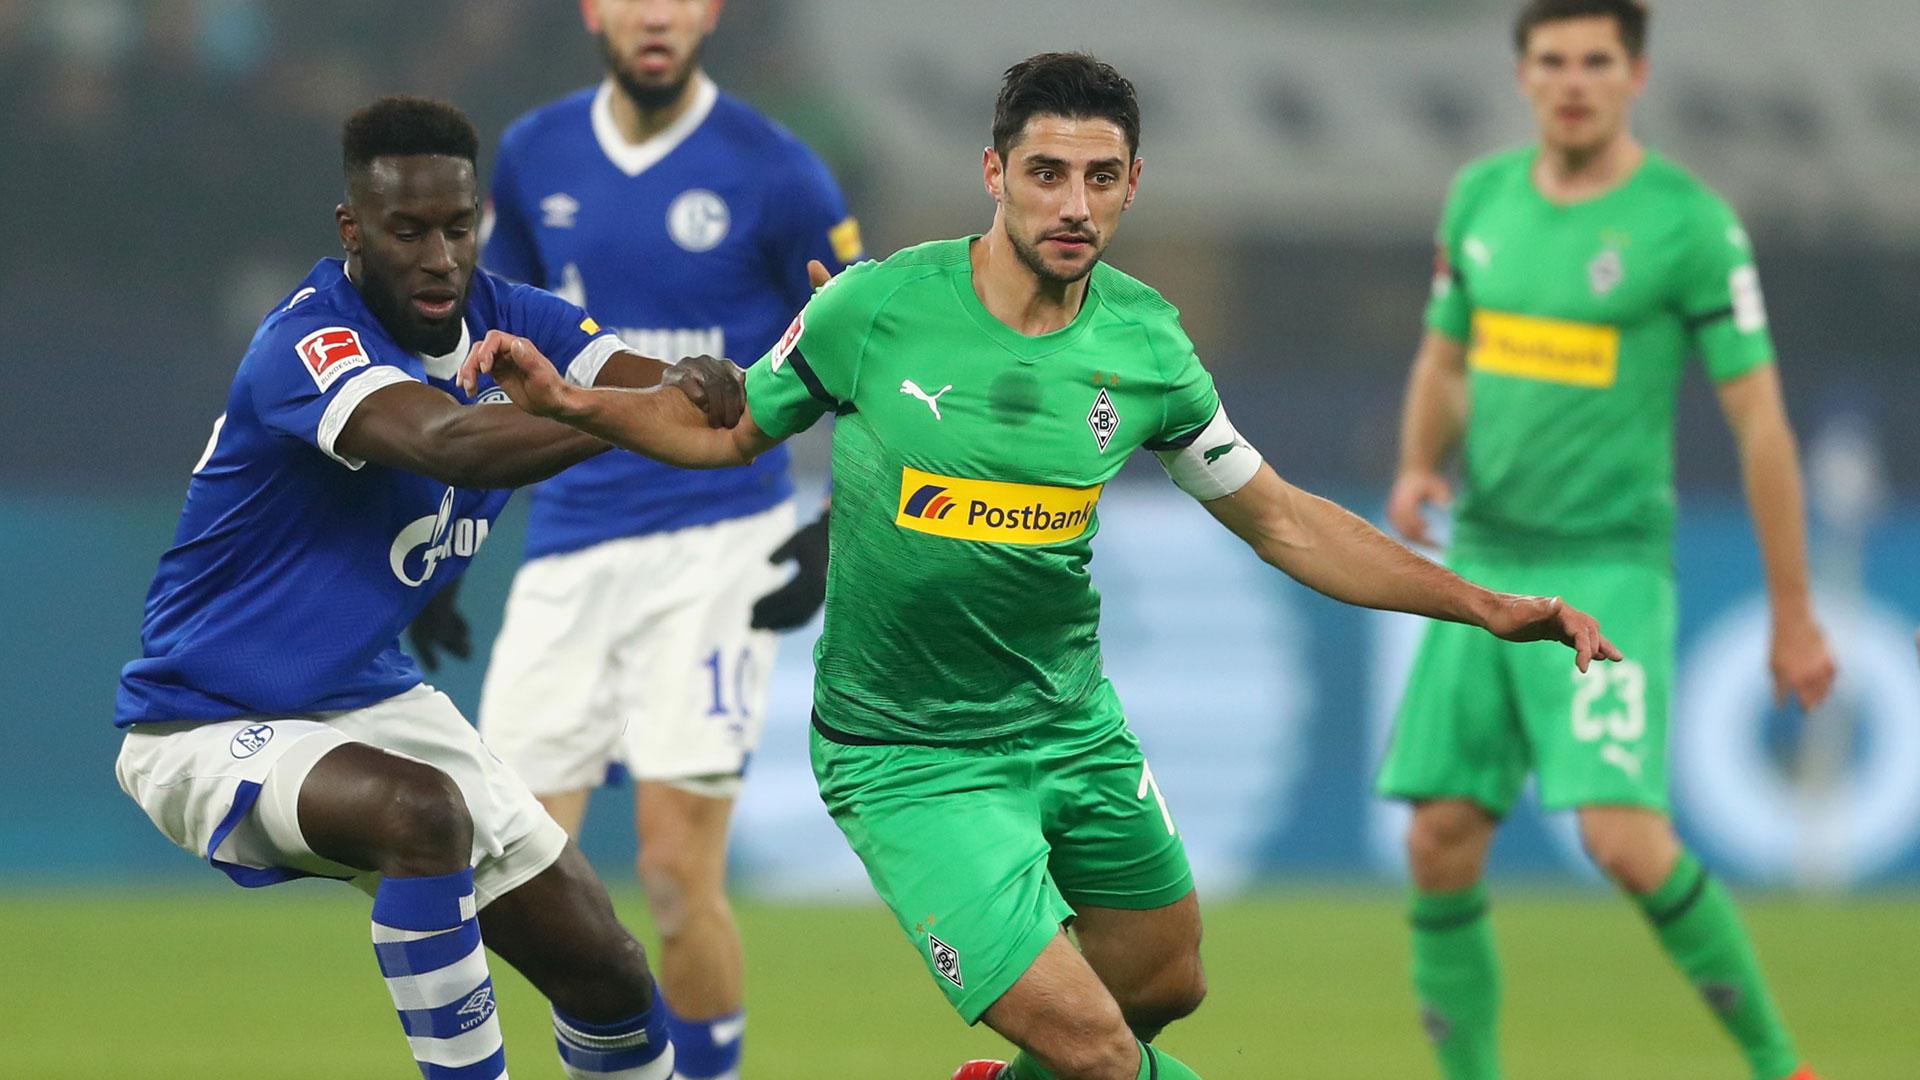 Lars Stindl Borussia Mönchengladbach Schalke 04 Bundesliga 02022019